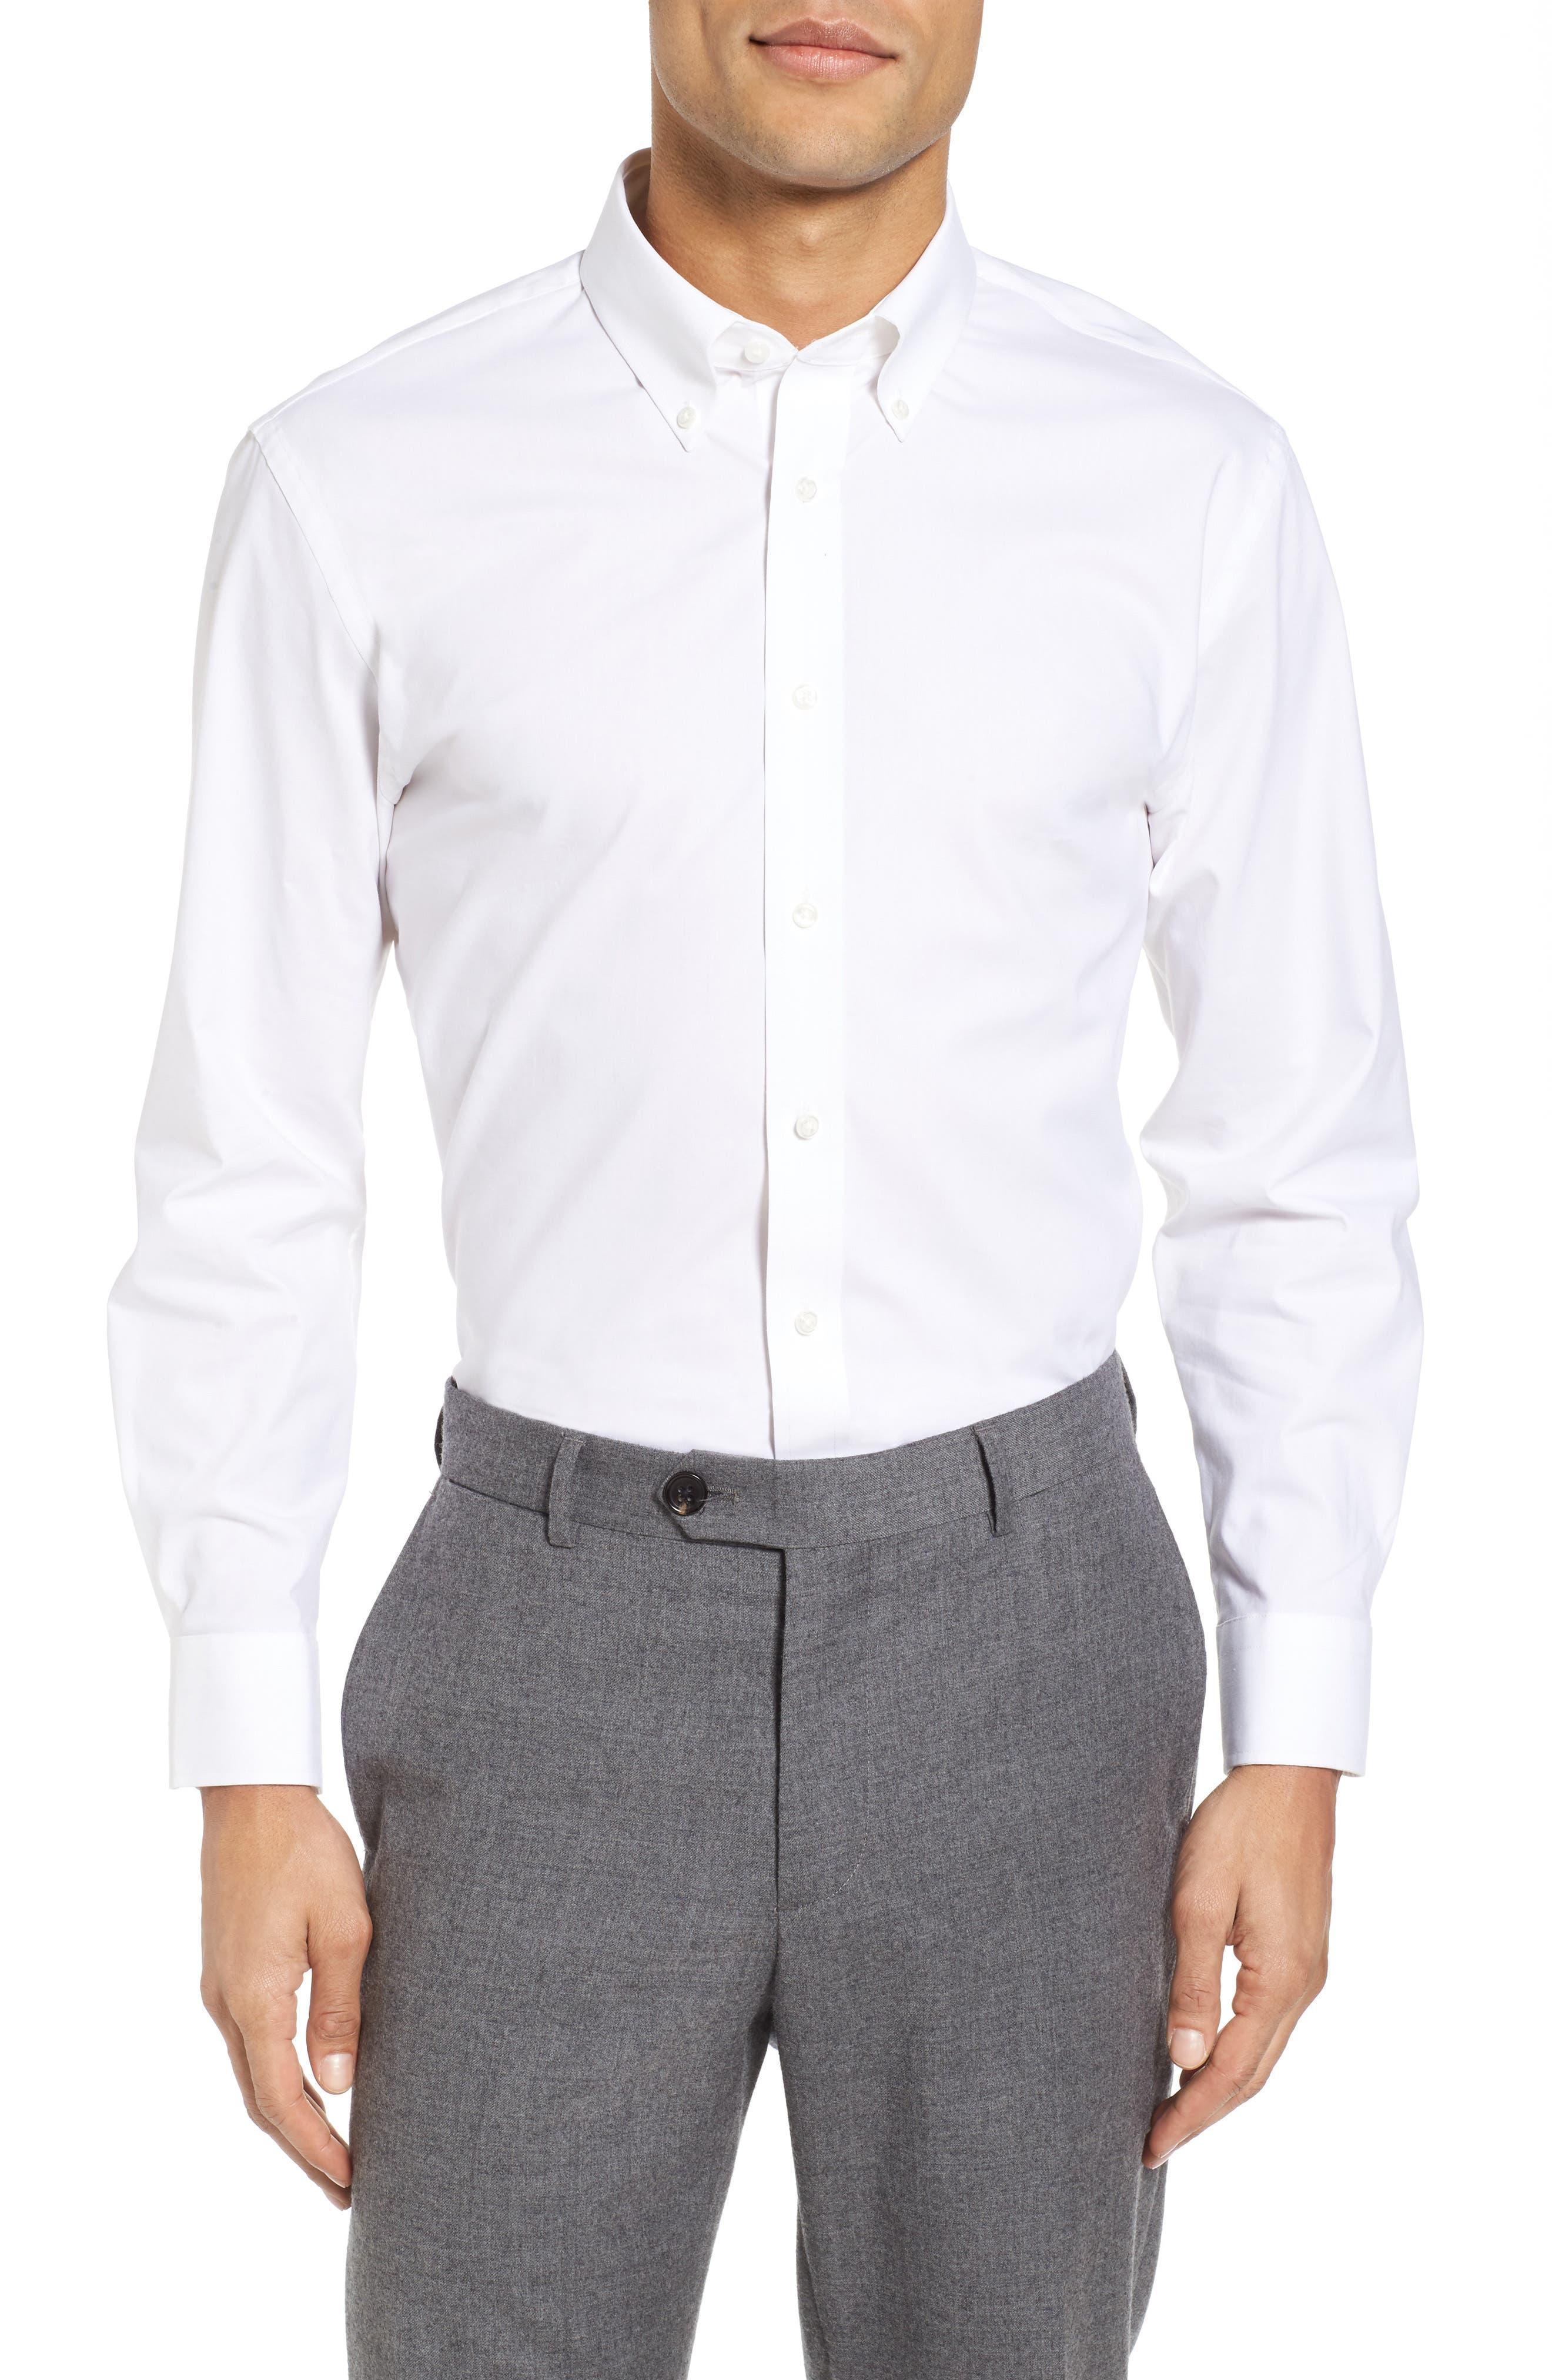 Tech-Smart Trim Fit Stretch Solid Dress Shirt,                             Main thumbnail 1, color,                             White